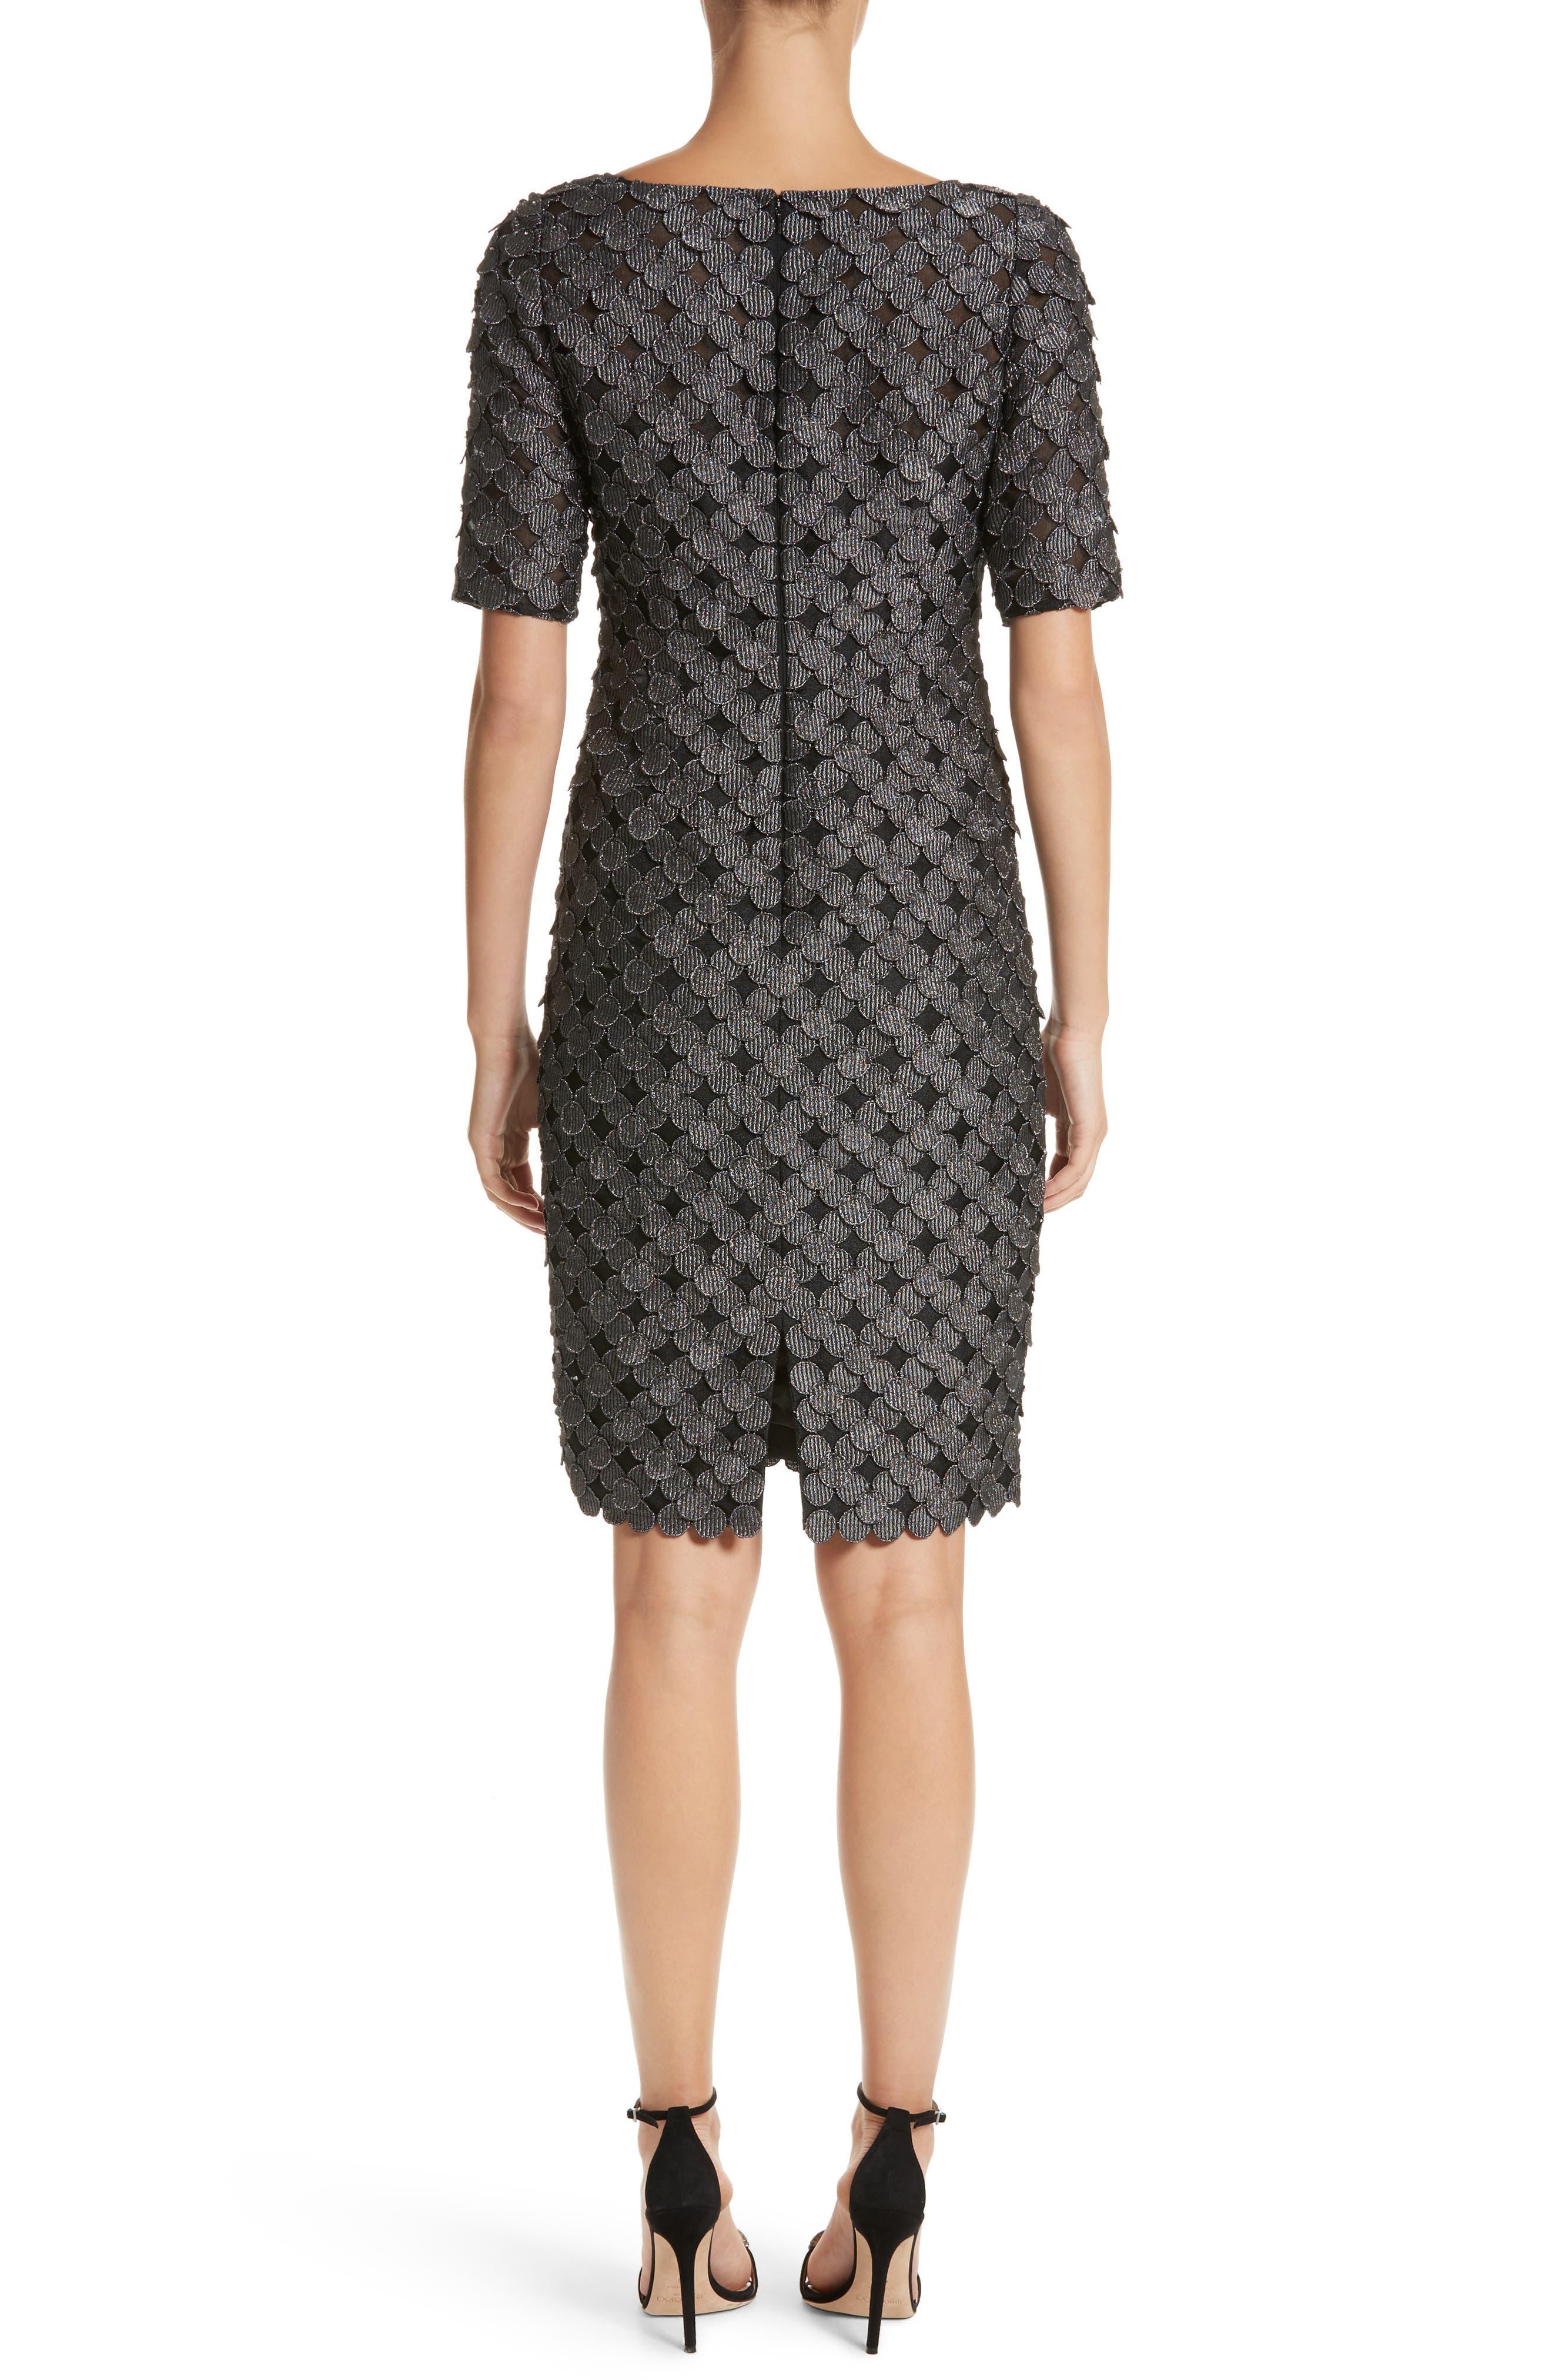 Carmen Marc Valvo Dot Appliqué Sheath Dress,                             Alternate thumbnail 2, color,                             030